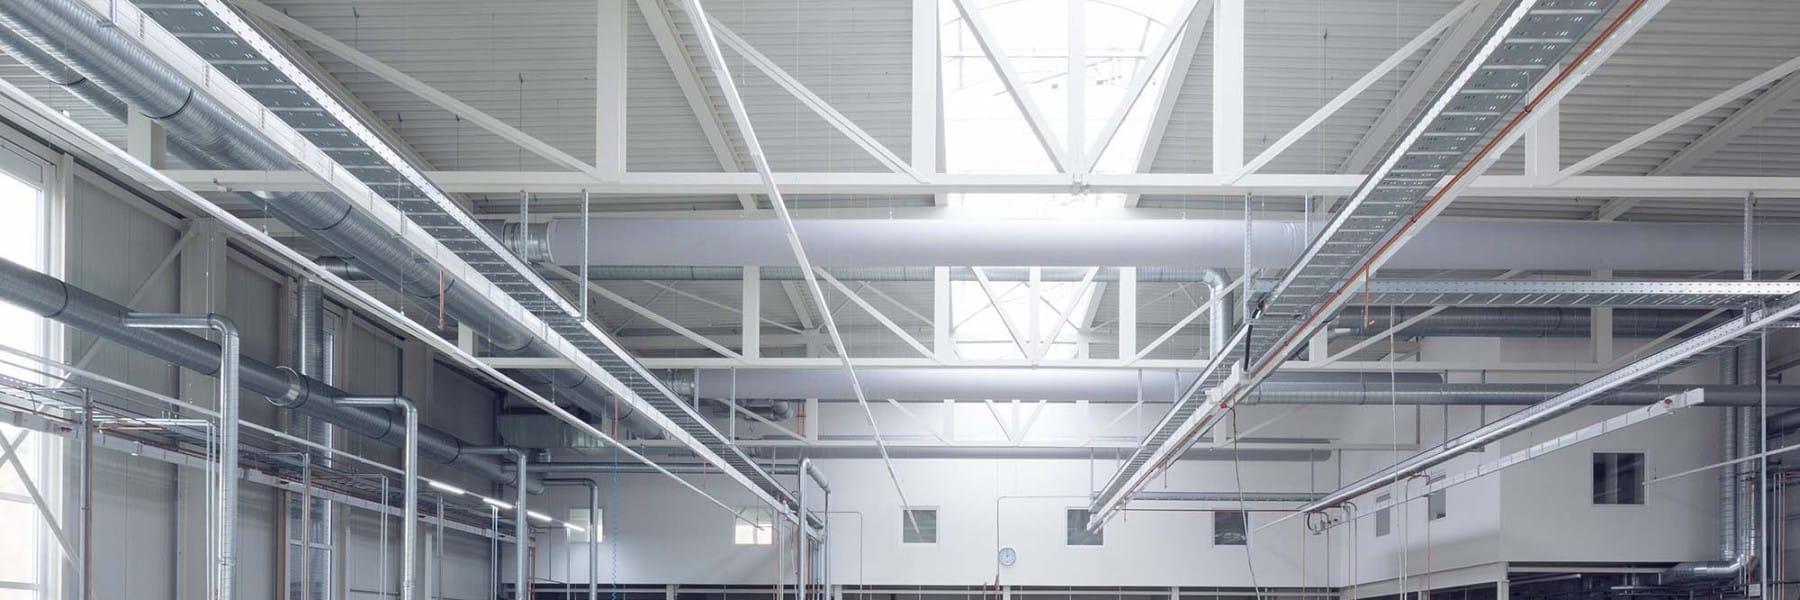 teilschlüsselfertiger Hallenbau